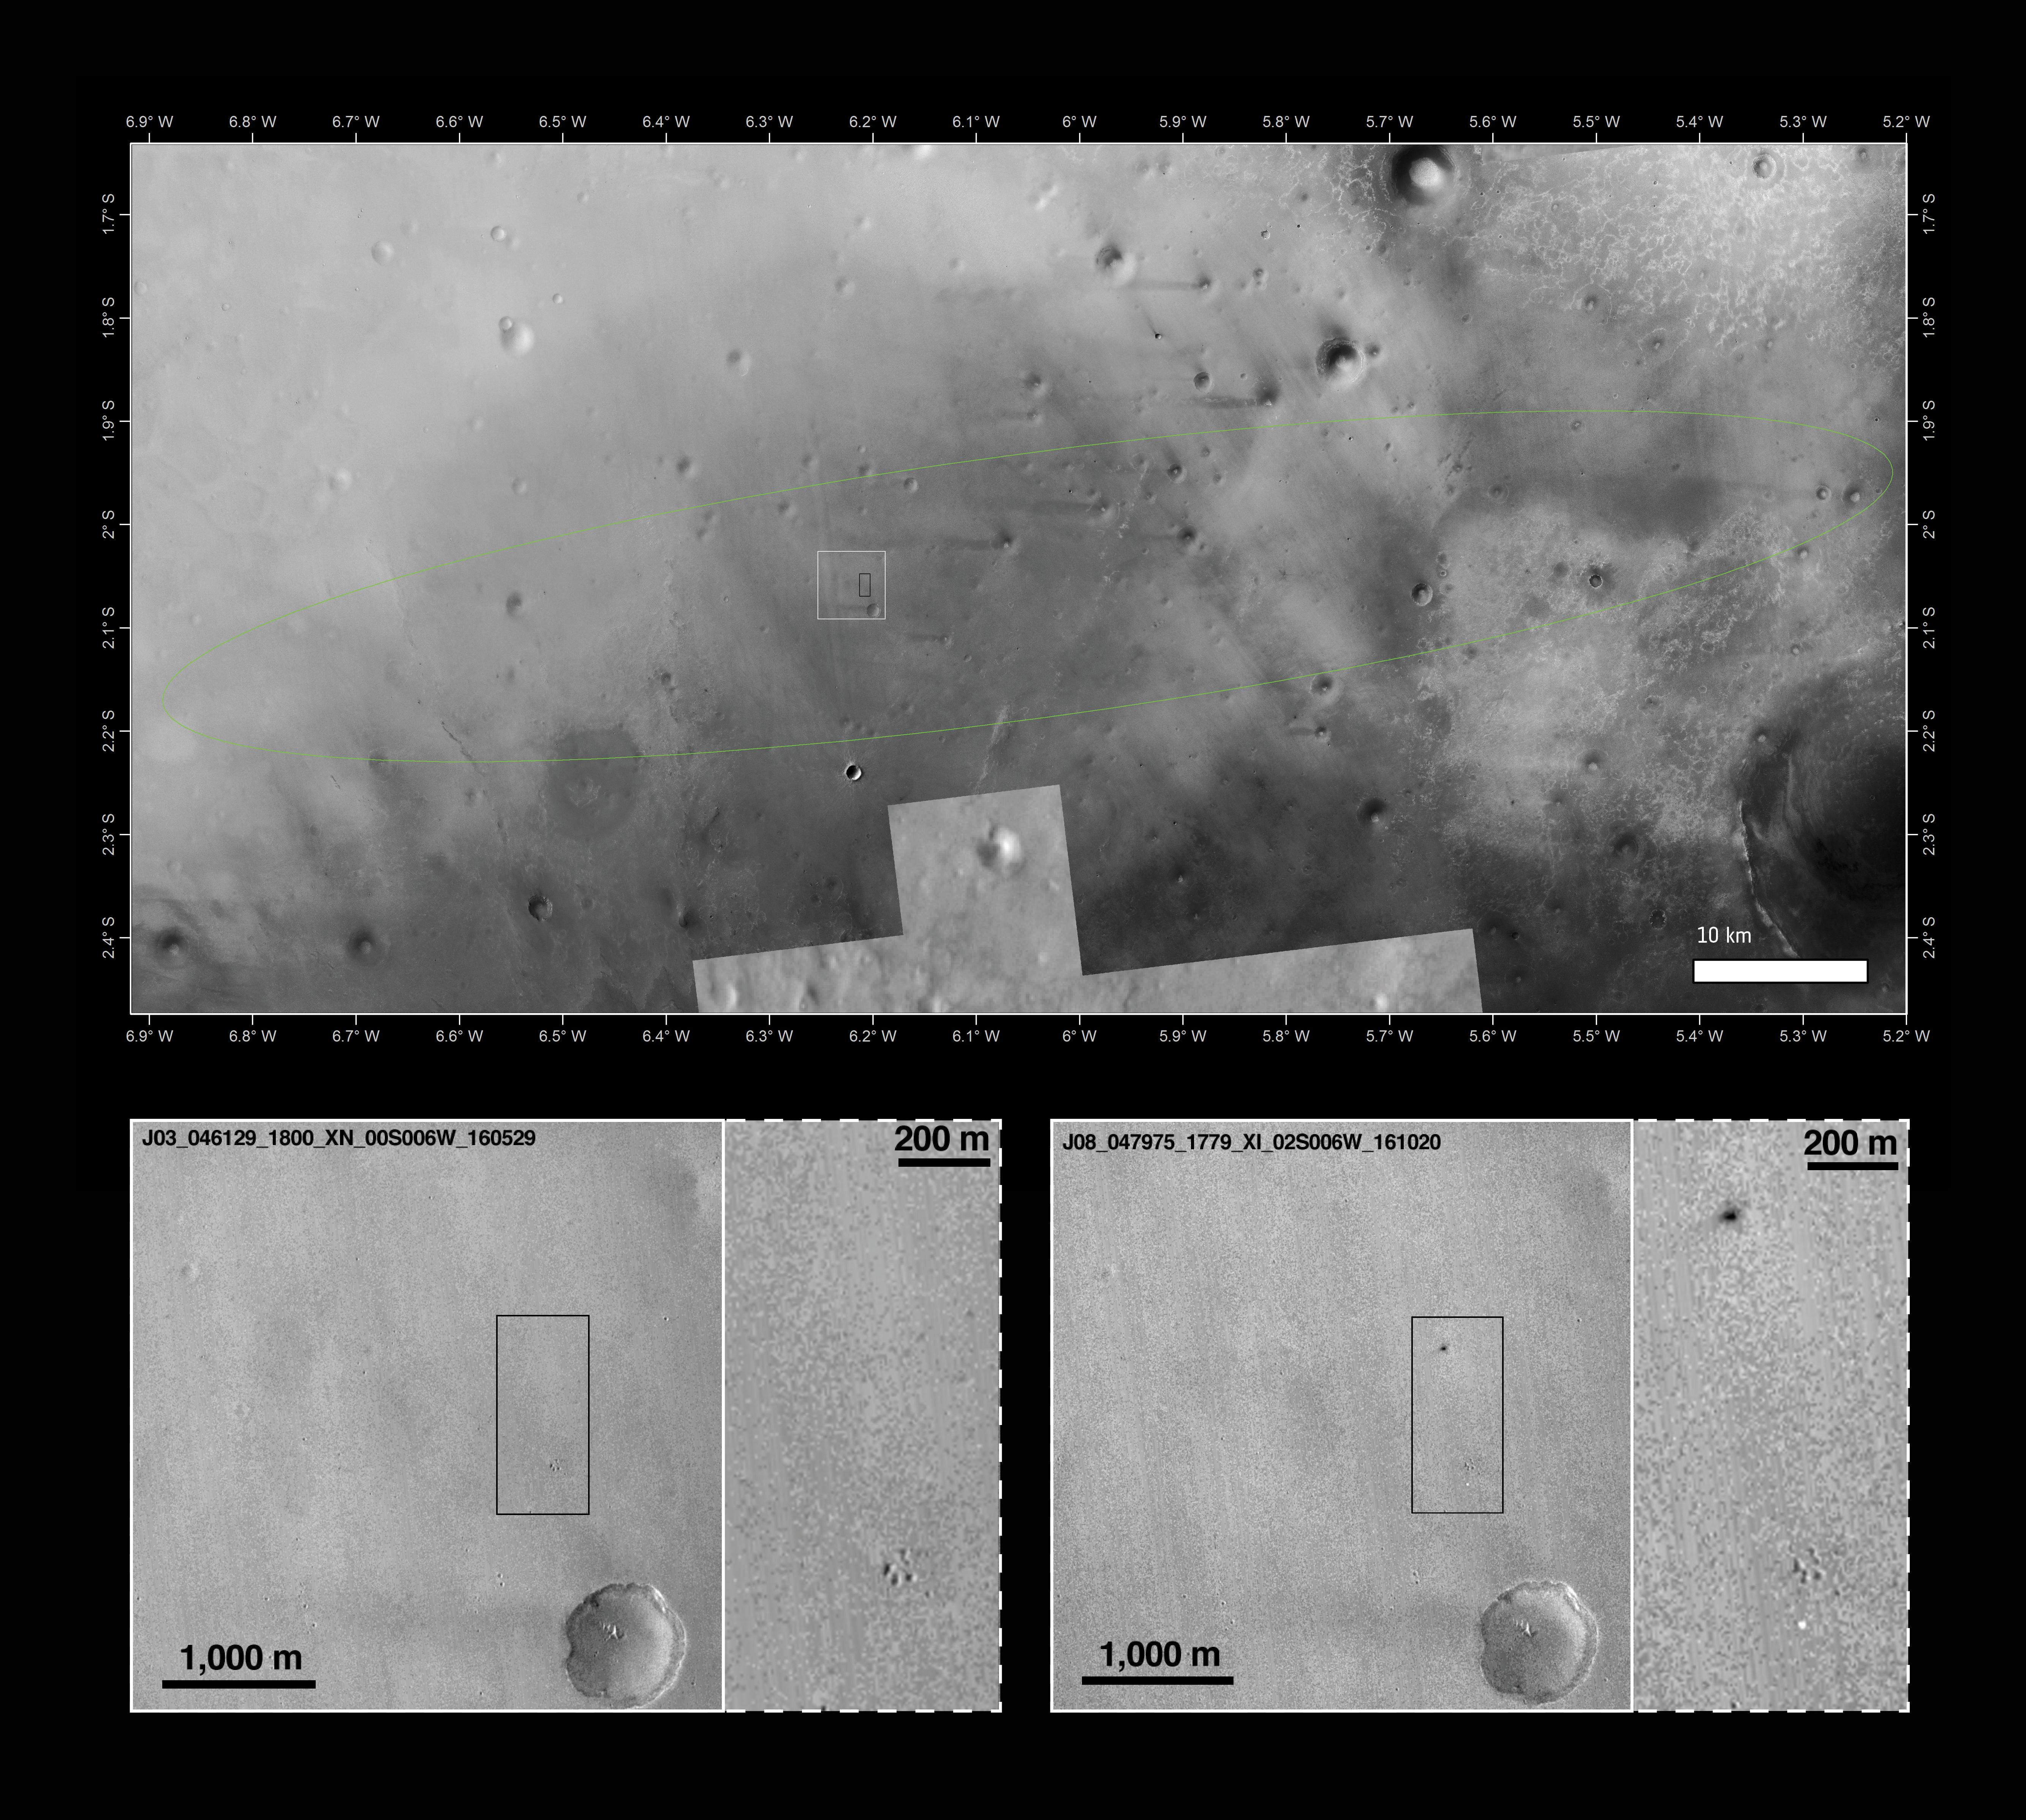 Aufnahmen der Schiaparelli-Aufschlagsstelle, Quelle: Main image: NASA/JPL-Caltech/MSSS, Arizona State University; inserts: NASA/JPL-Caltech/MSSS